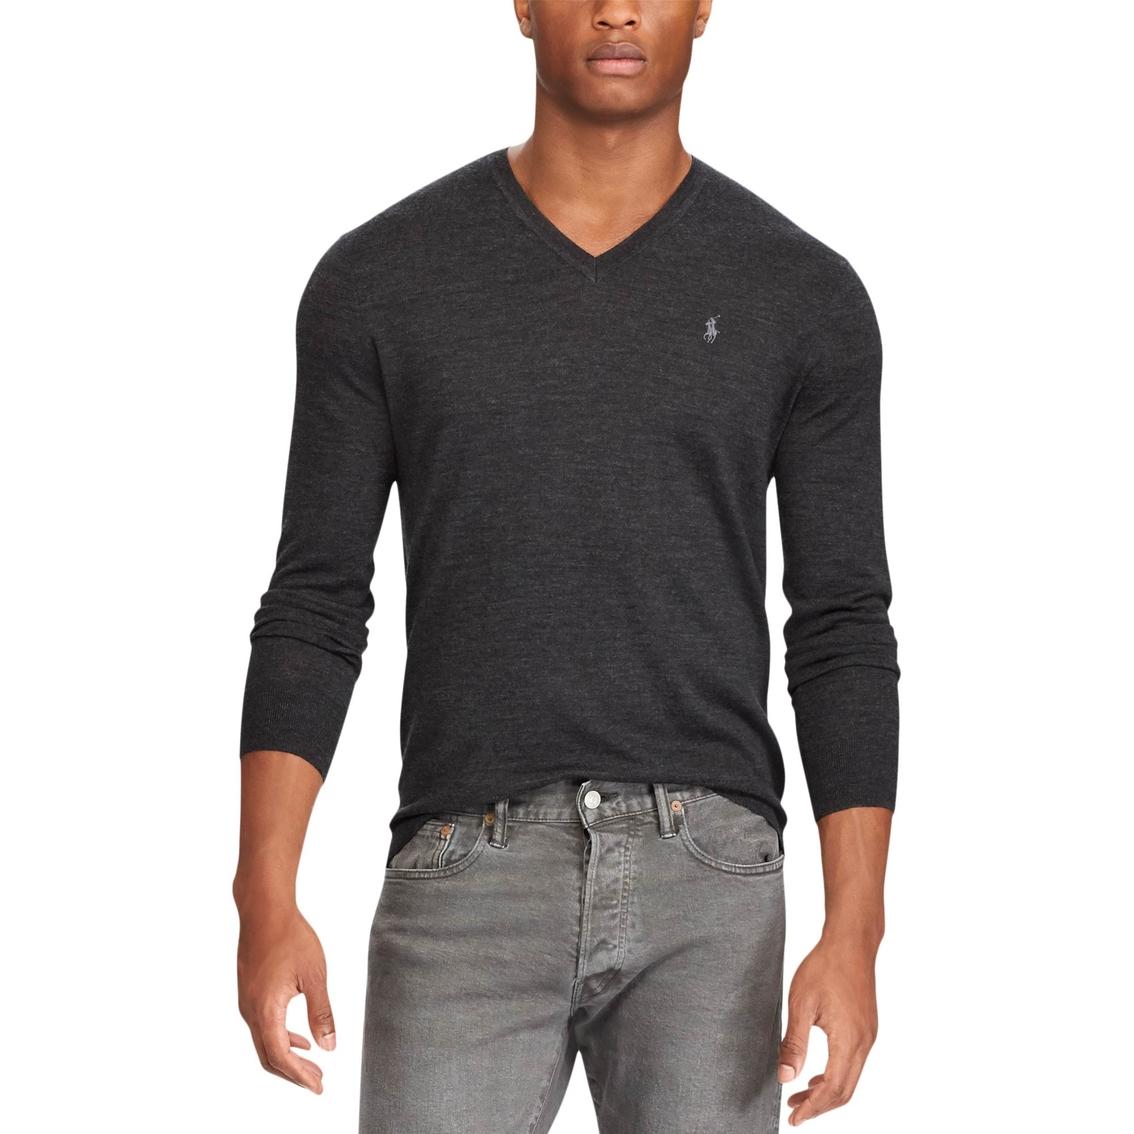 c7fa85a4 Polo Ralph Lauren Washable Merino Wool Sweater | Polo Ralph Lauren ...